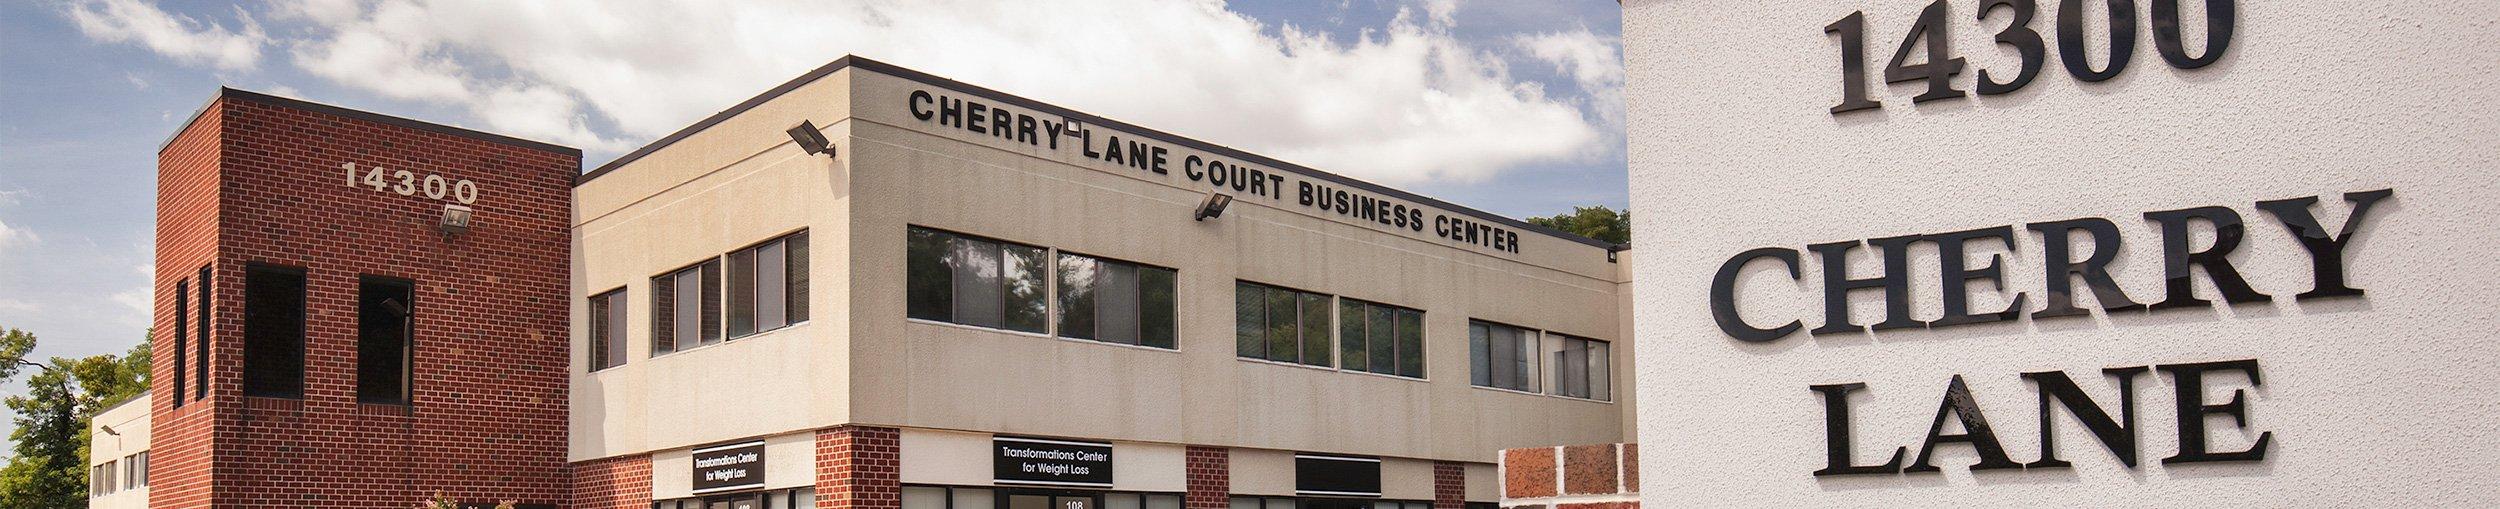 Cherry Lane Court